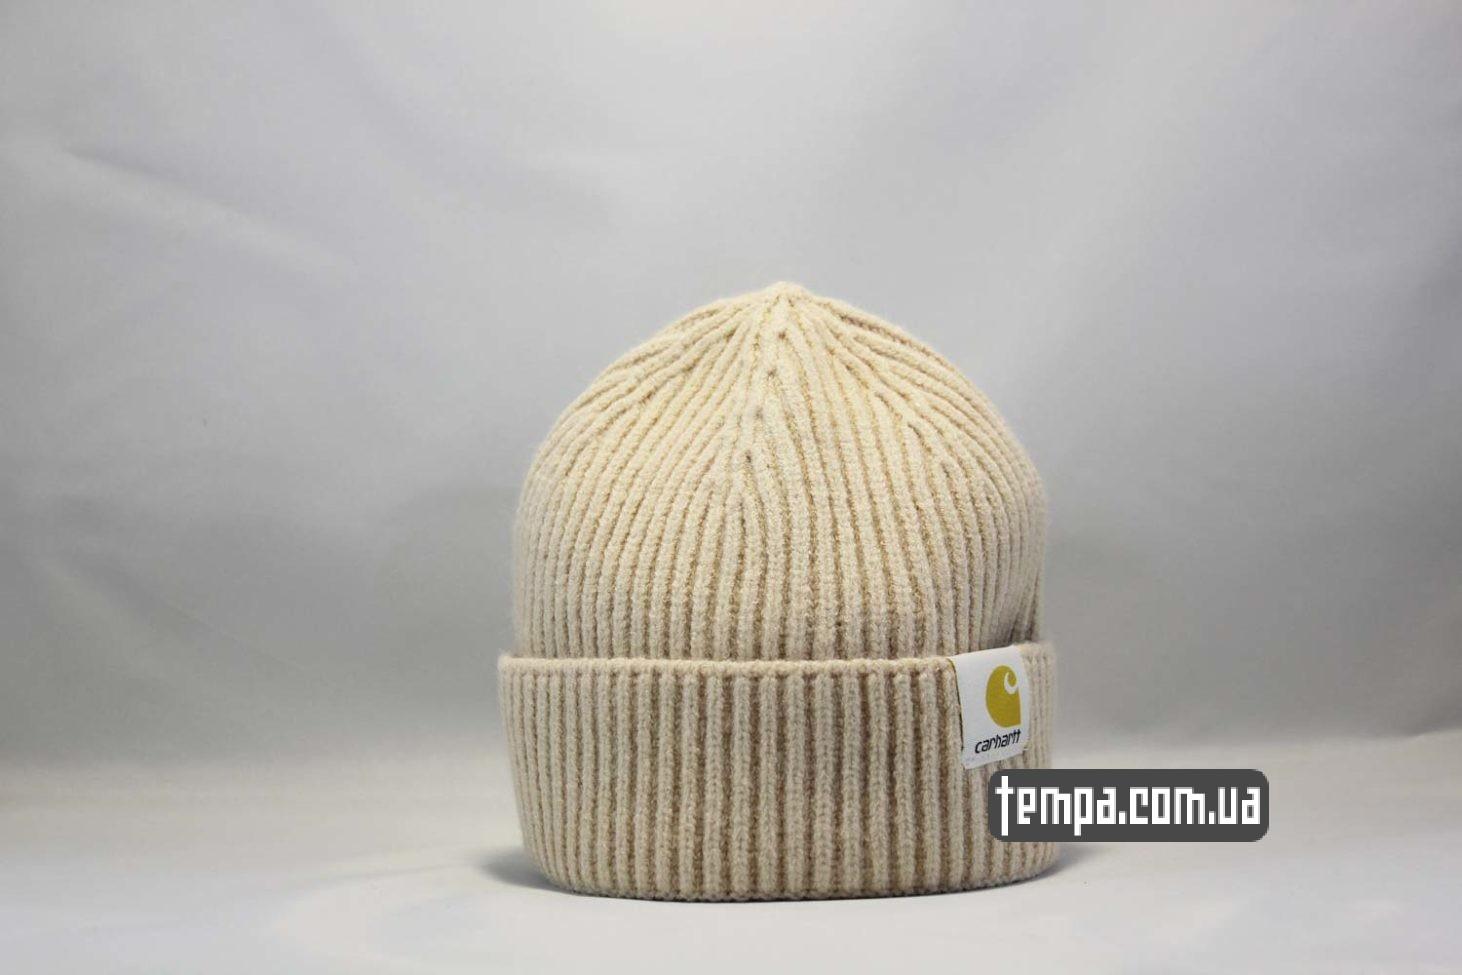 шапка beanie Carhartt бежевая купить Украина